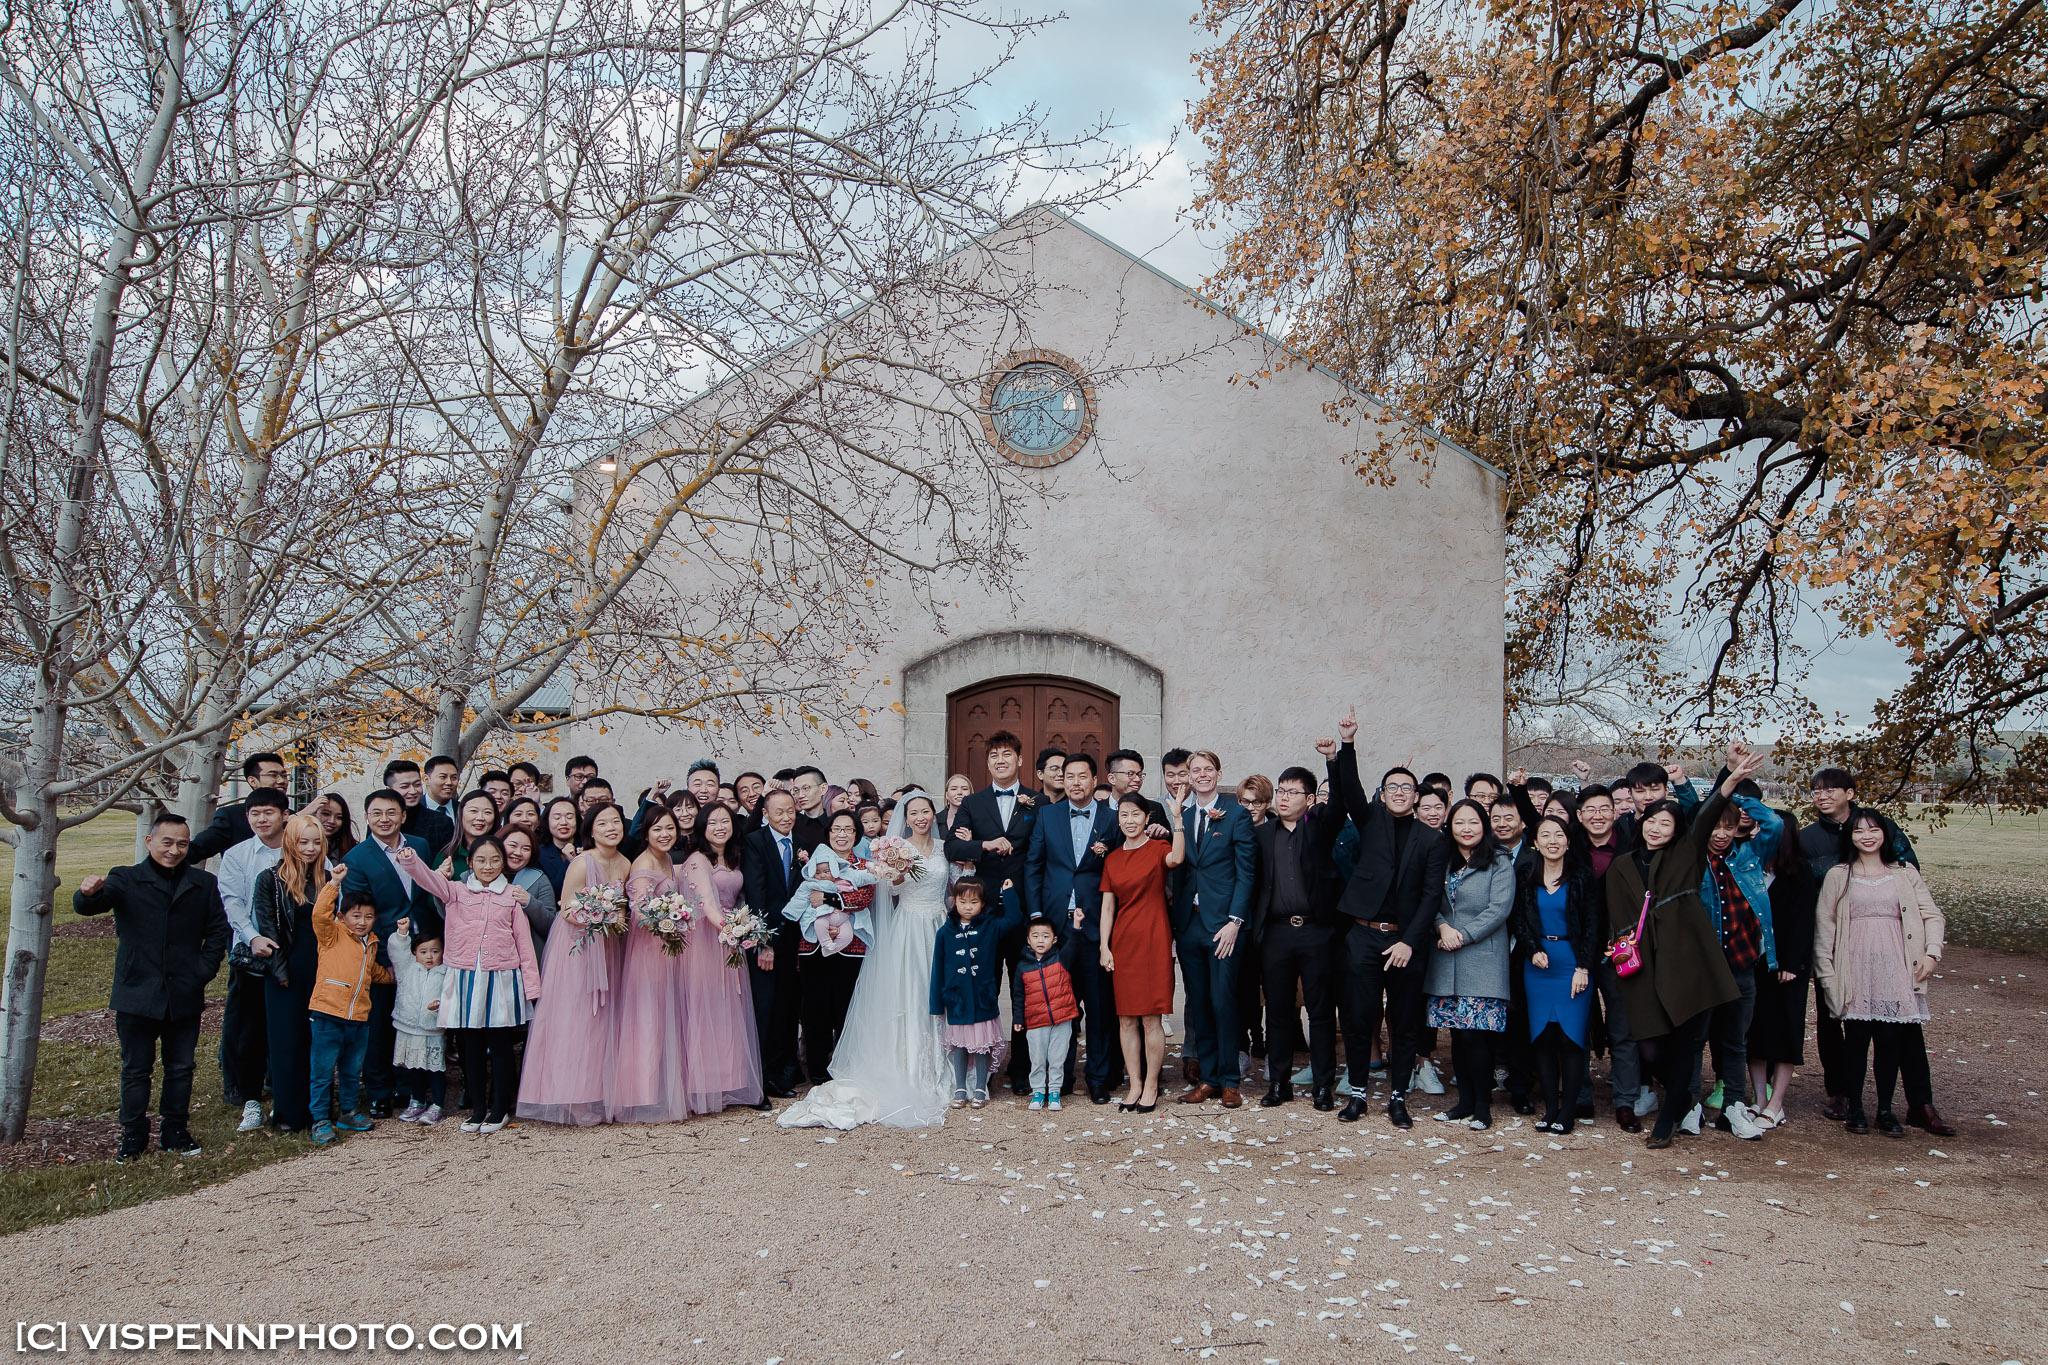 WEDDING DAY Photography Melbourne VISPENN 墨尔本 婚礼跟拍 婚礼摄像 婚礼摄影 结婚照 登记照 CoreyCoco 2P 06375 5D4 VISPENN